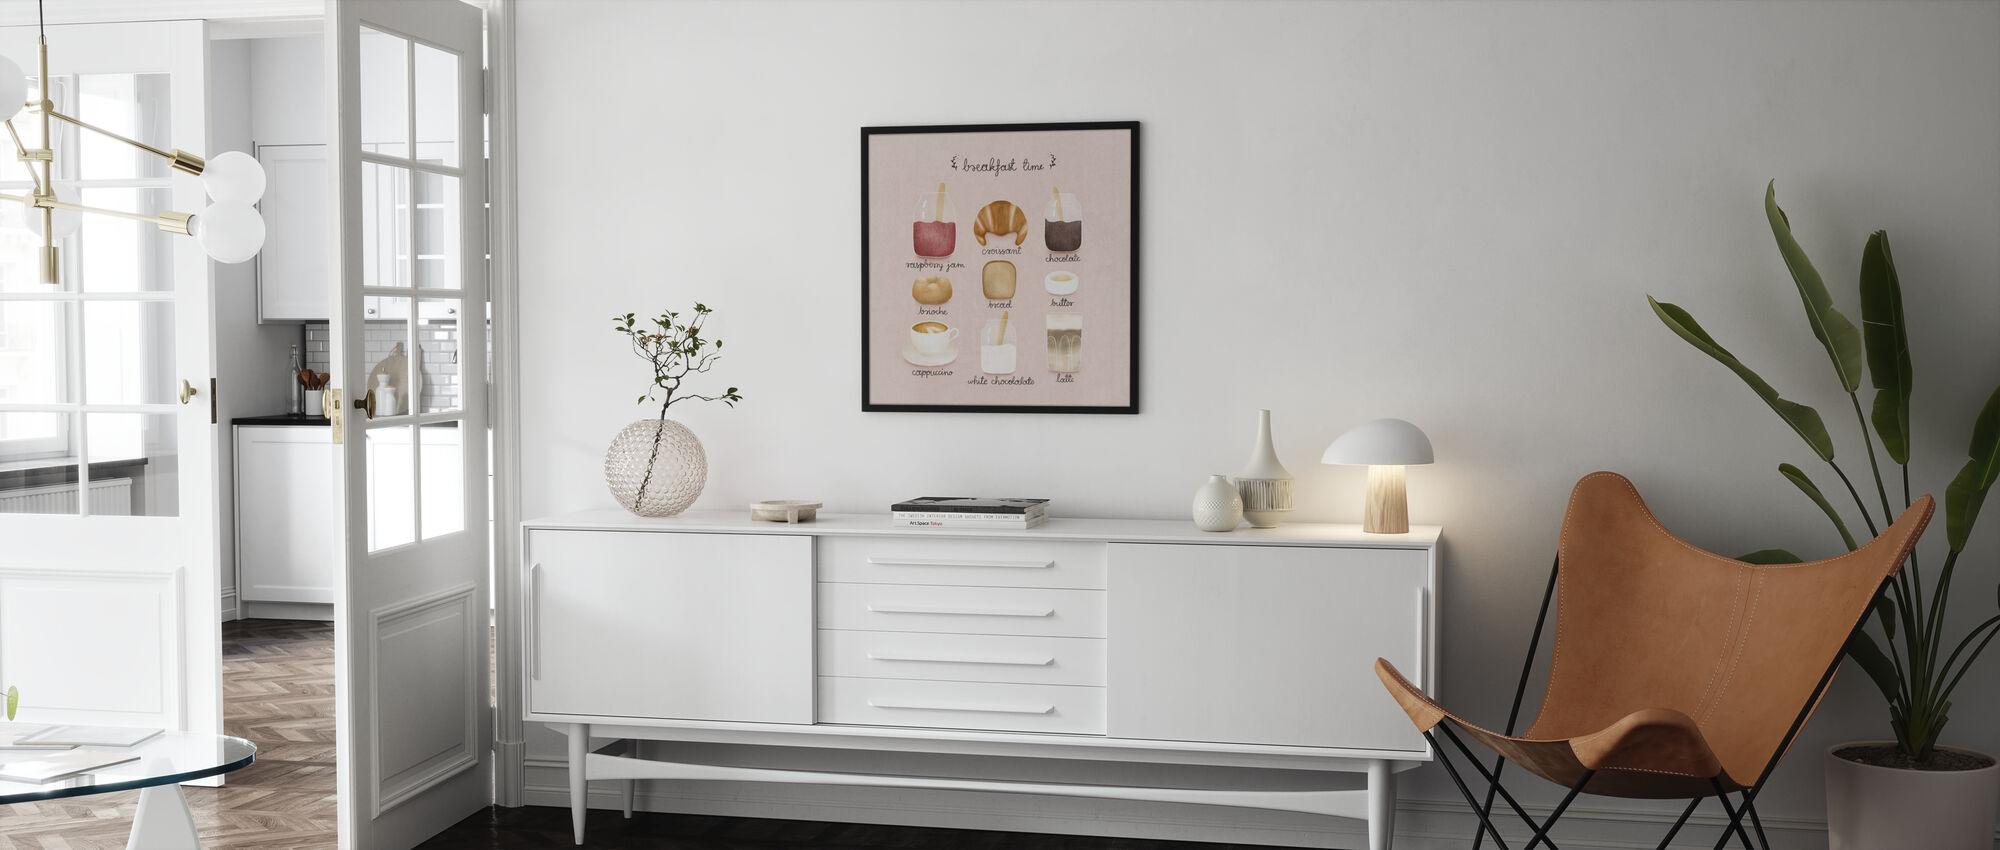 Time for Breakfast - Poster - Living Room